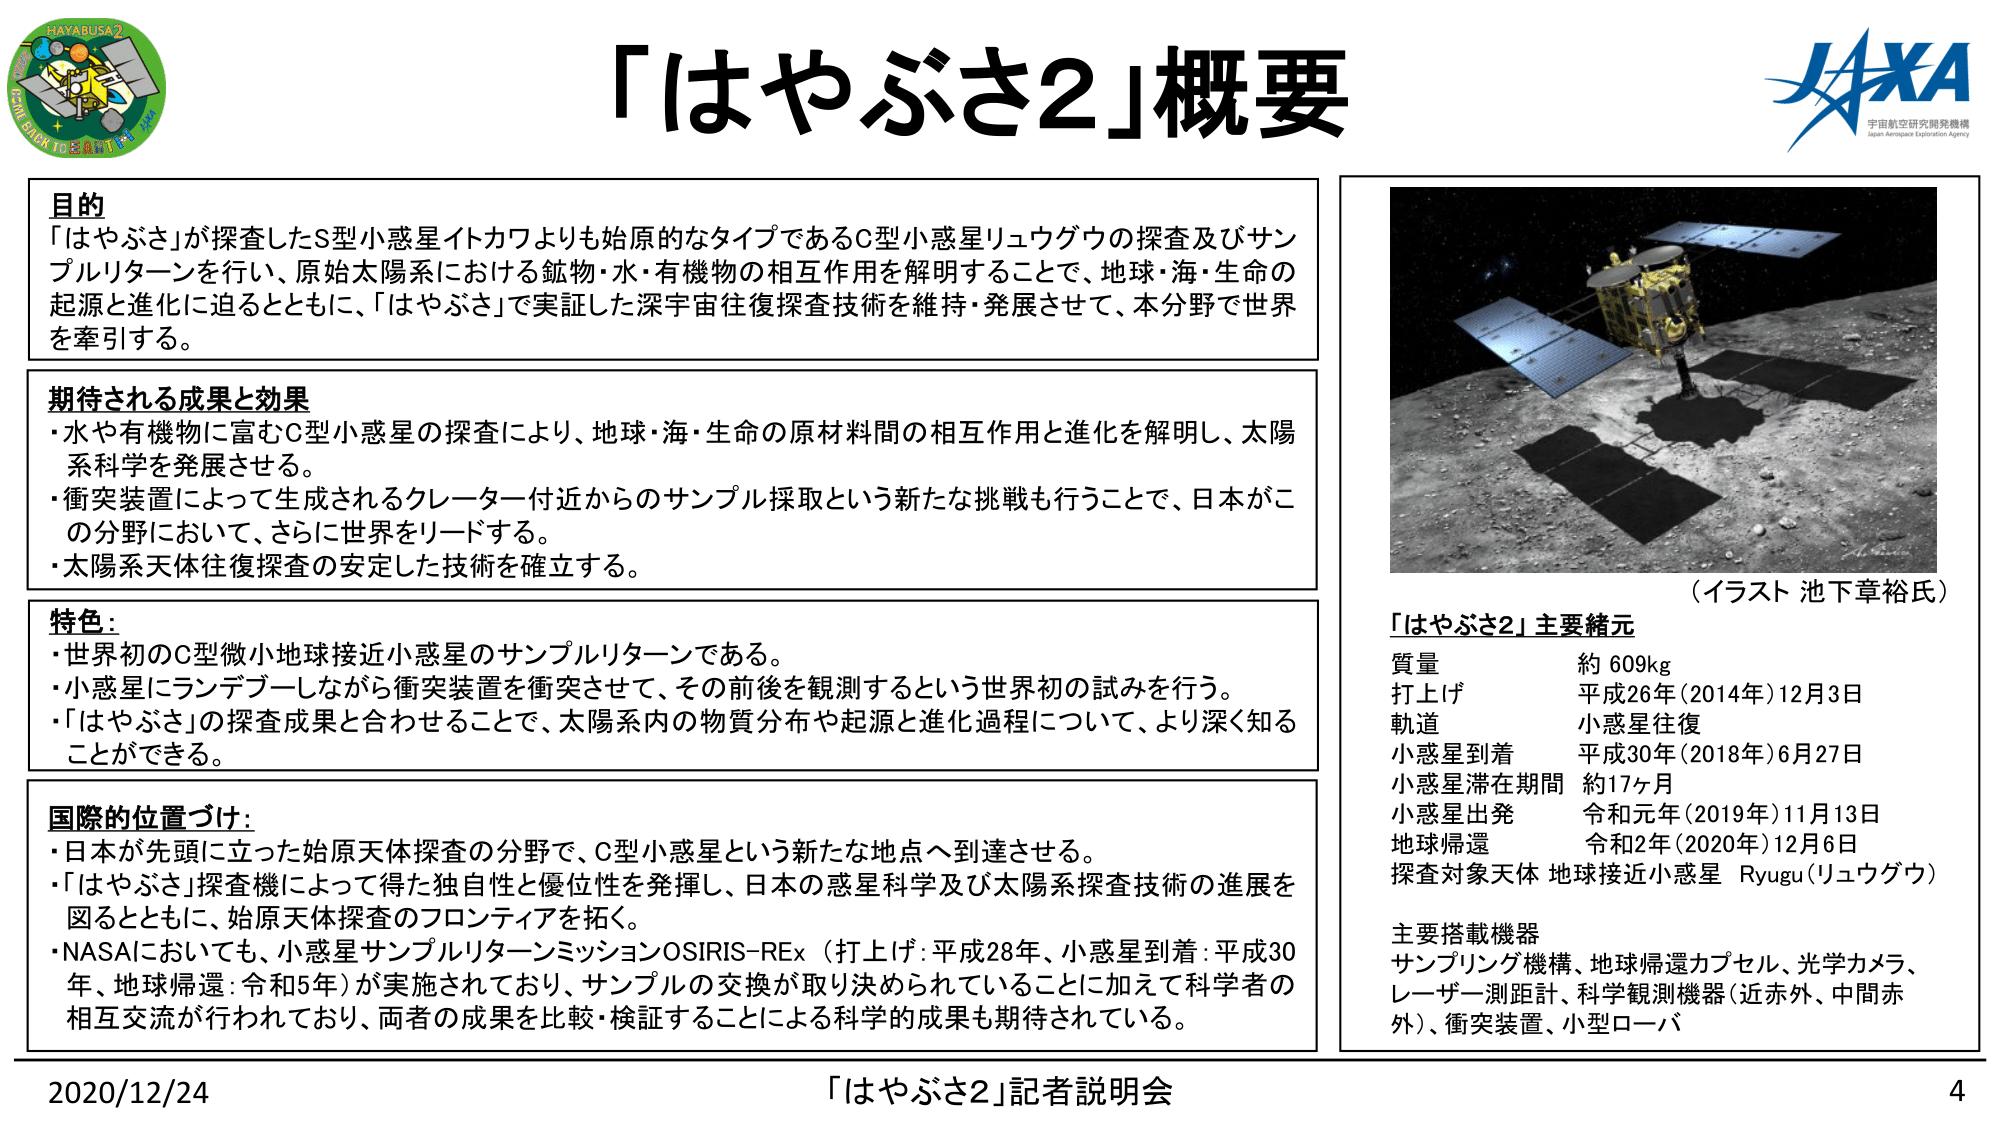 f:id:Imamura:20201224134957p:plain